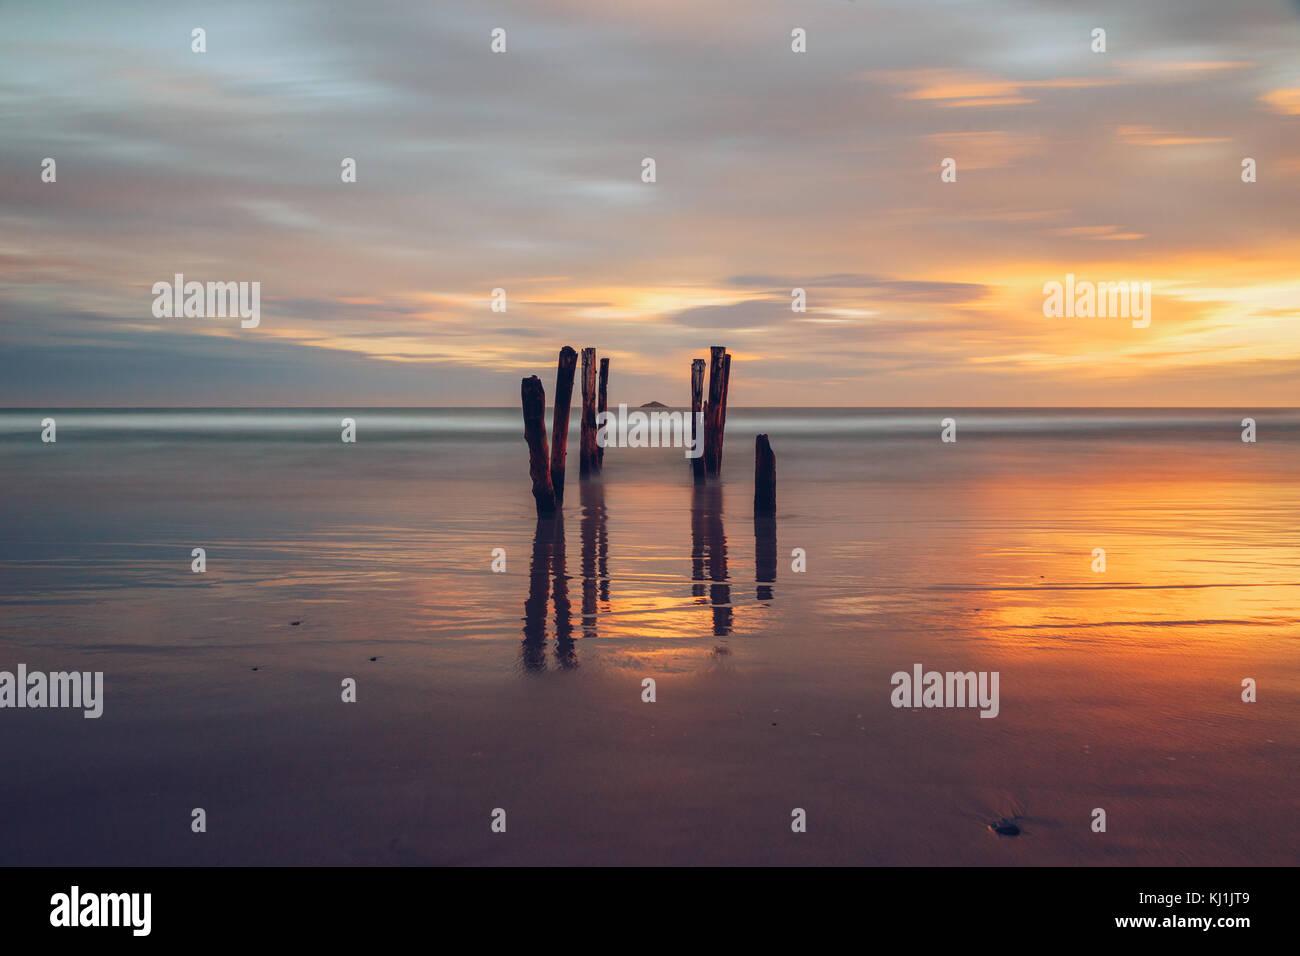 St Clair's Beach, Dunedin, New Zealand - Stock Image